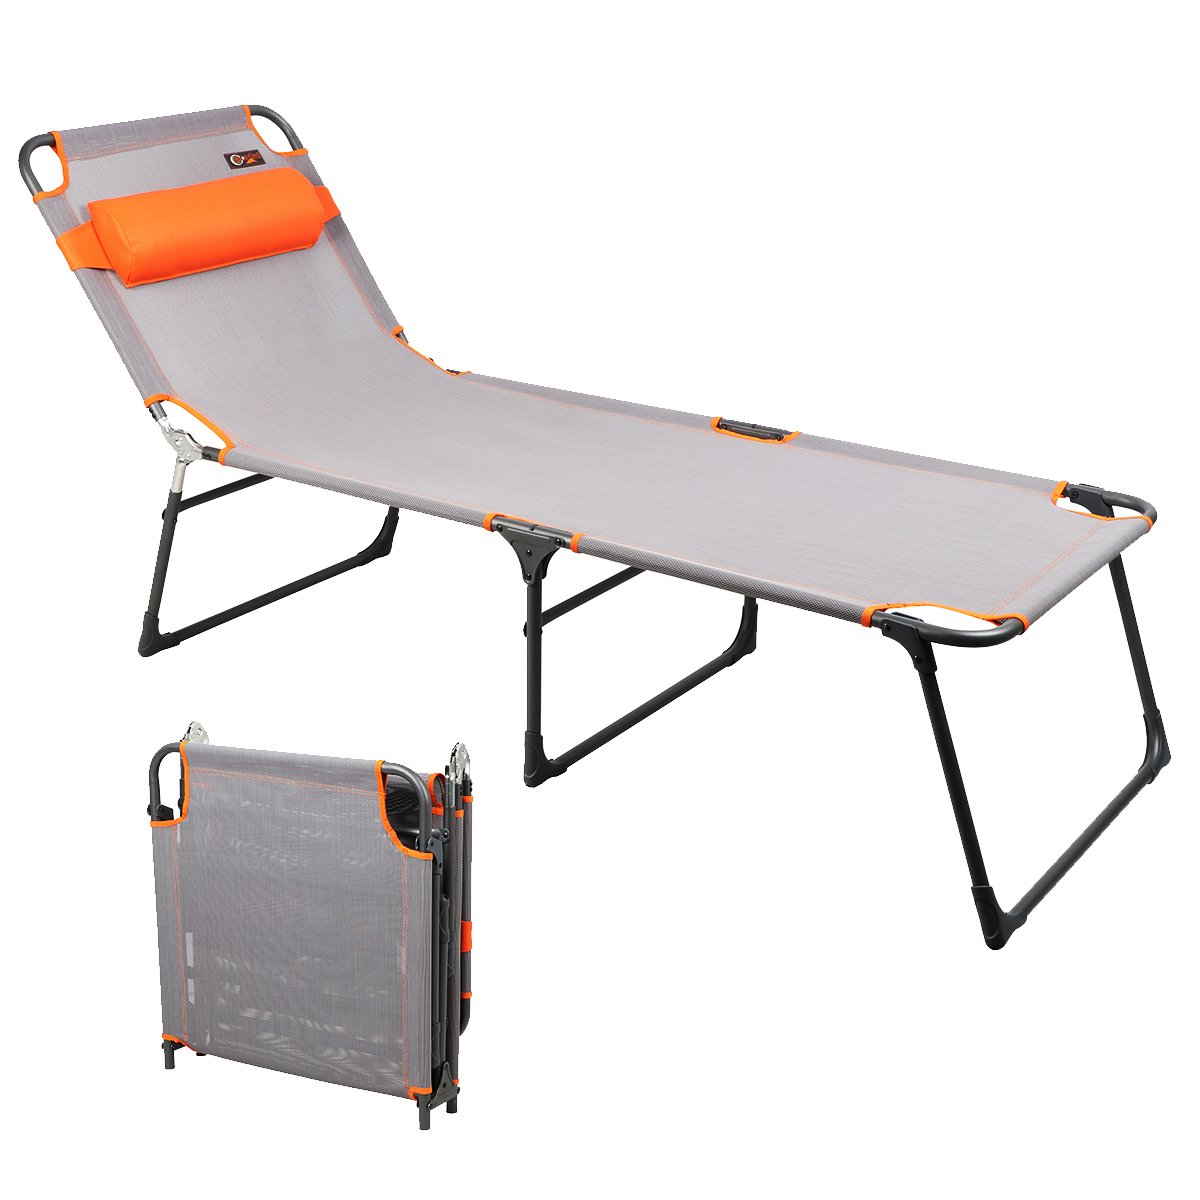 PORTAL Adjustable Folding Reclining Lounger Beach Bed Cot, Grey